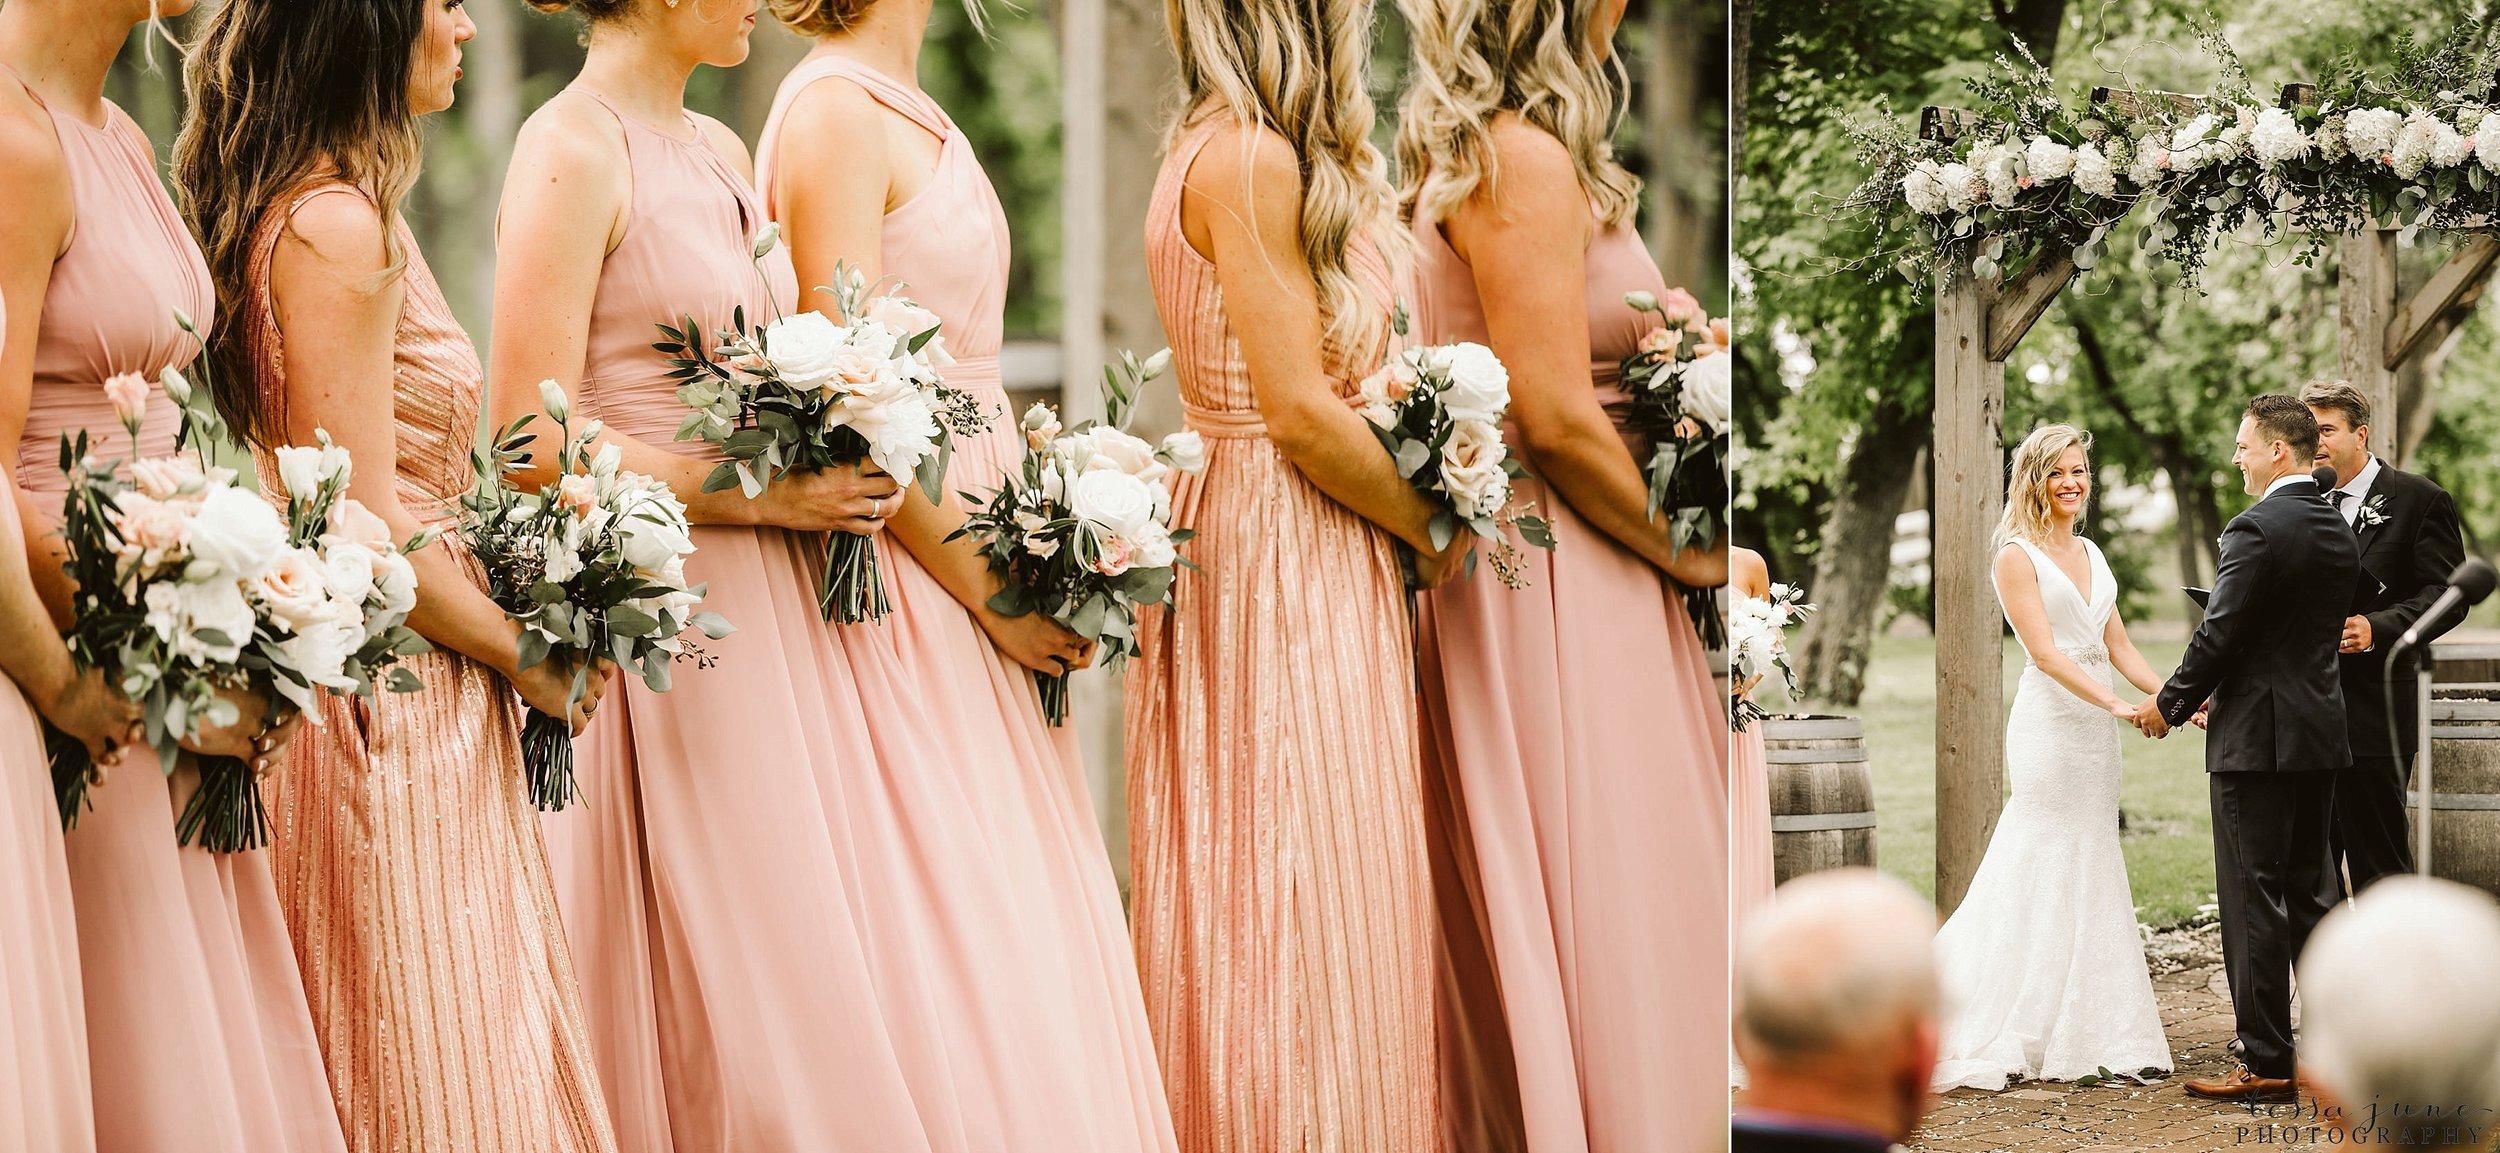 carlos-creek-winery-wedding-summer-pristine-floral-blush-pink-navy-alexandria-minnesota-113.jpg